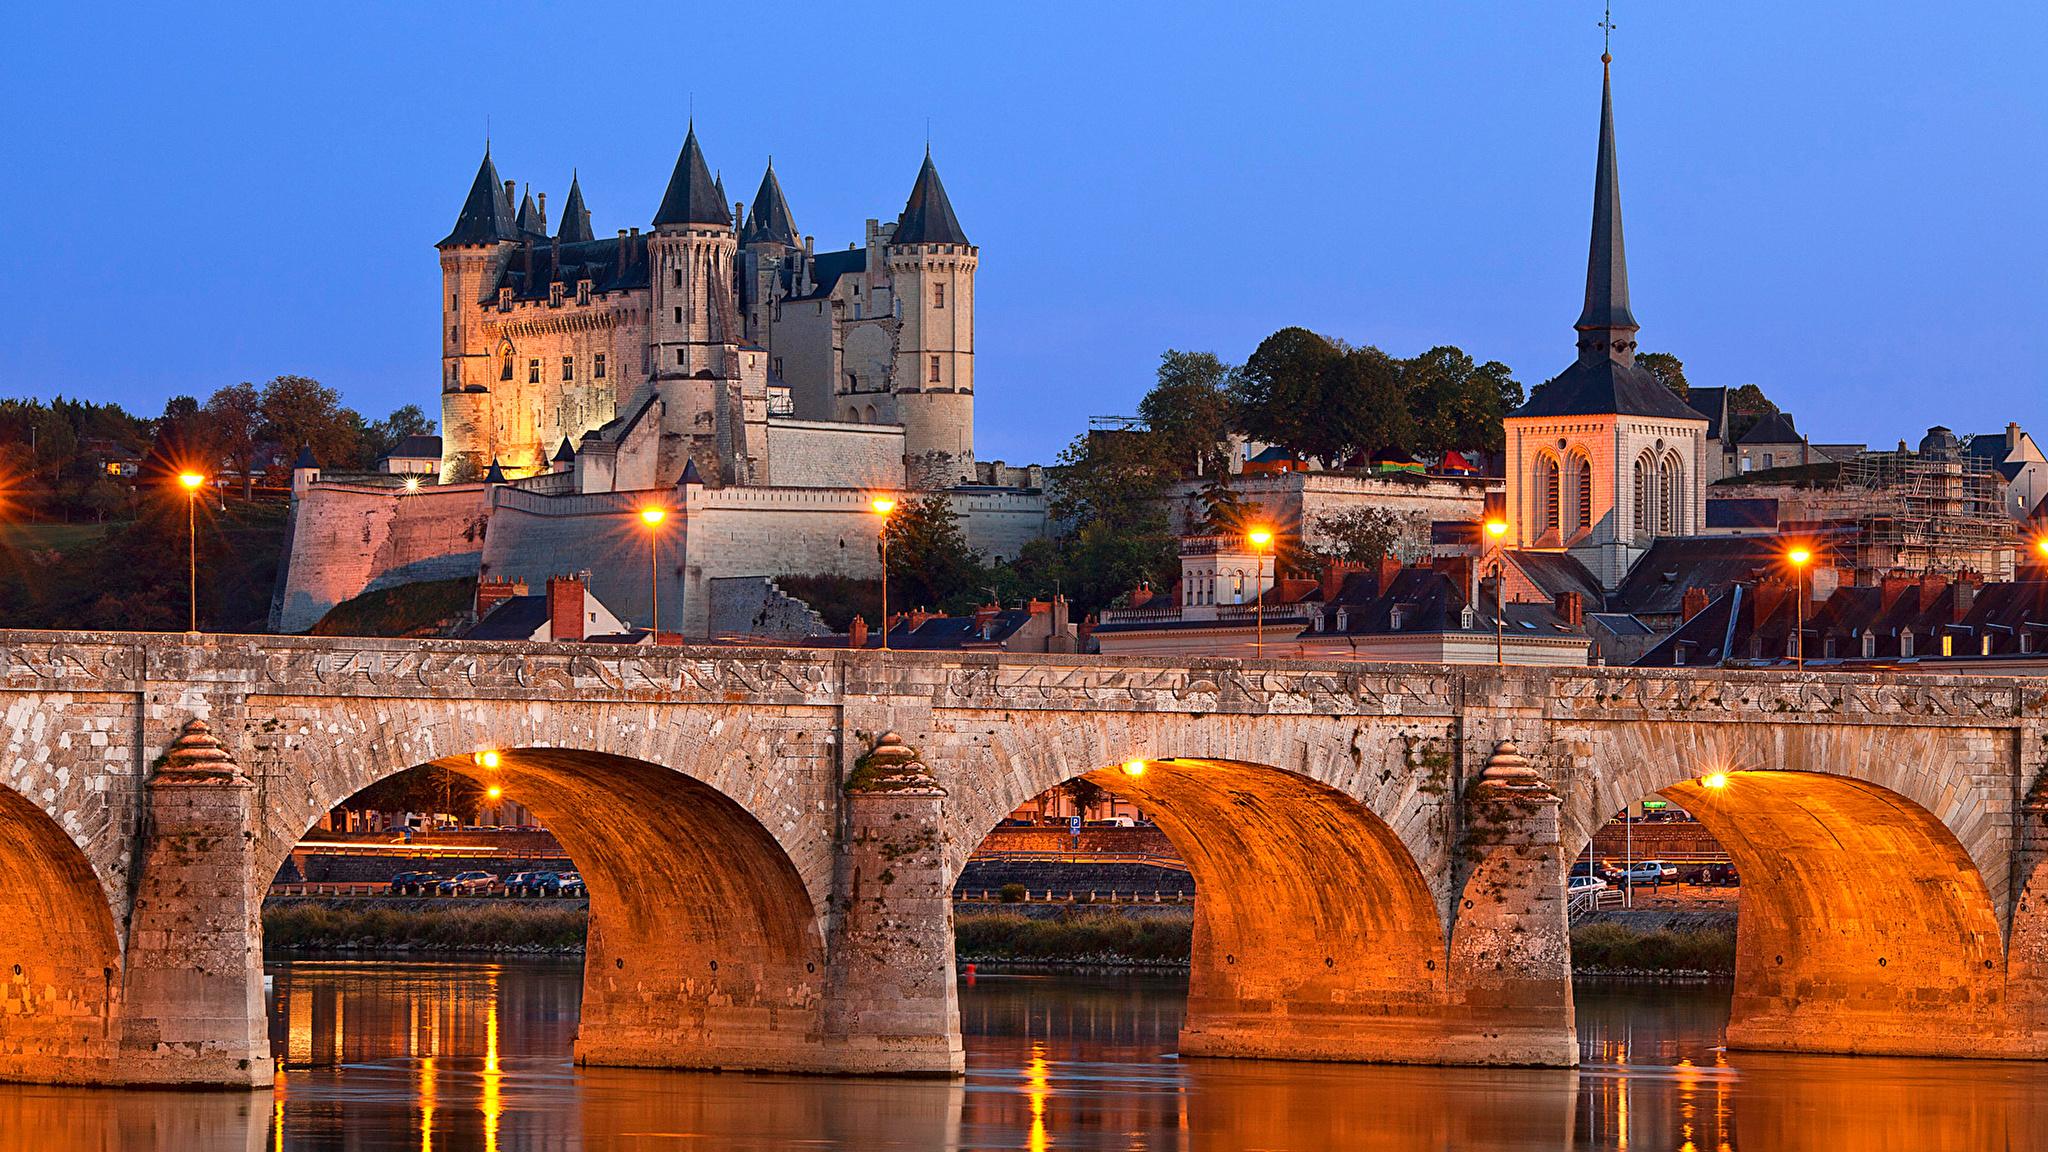 Chateau de Saumur, Saumur, France загрузить